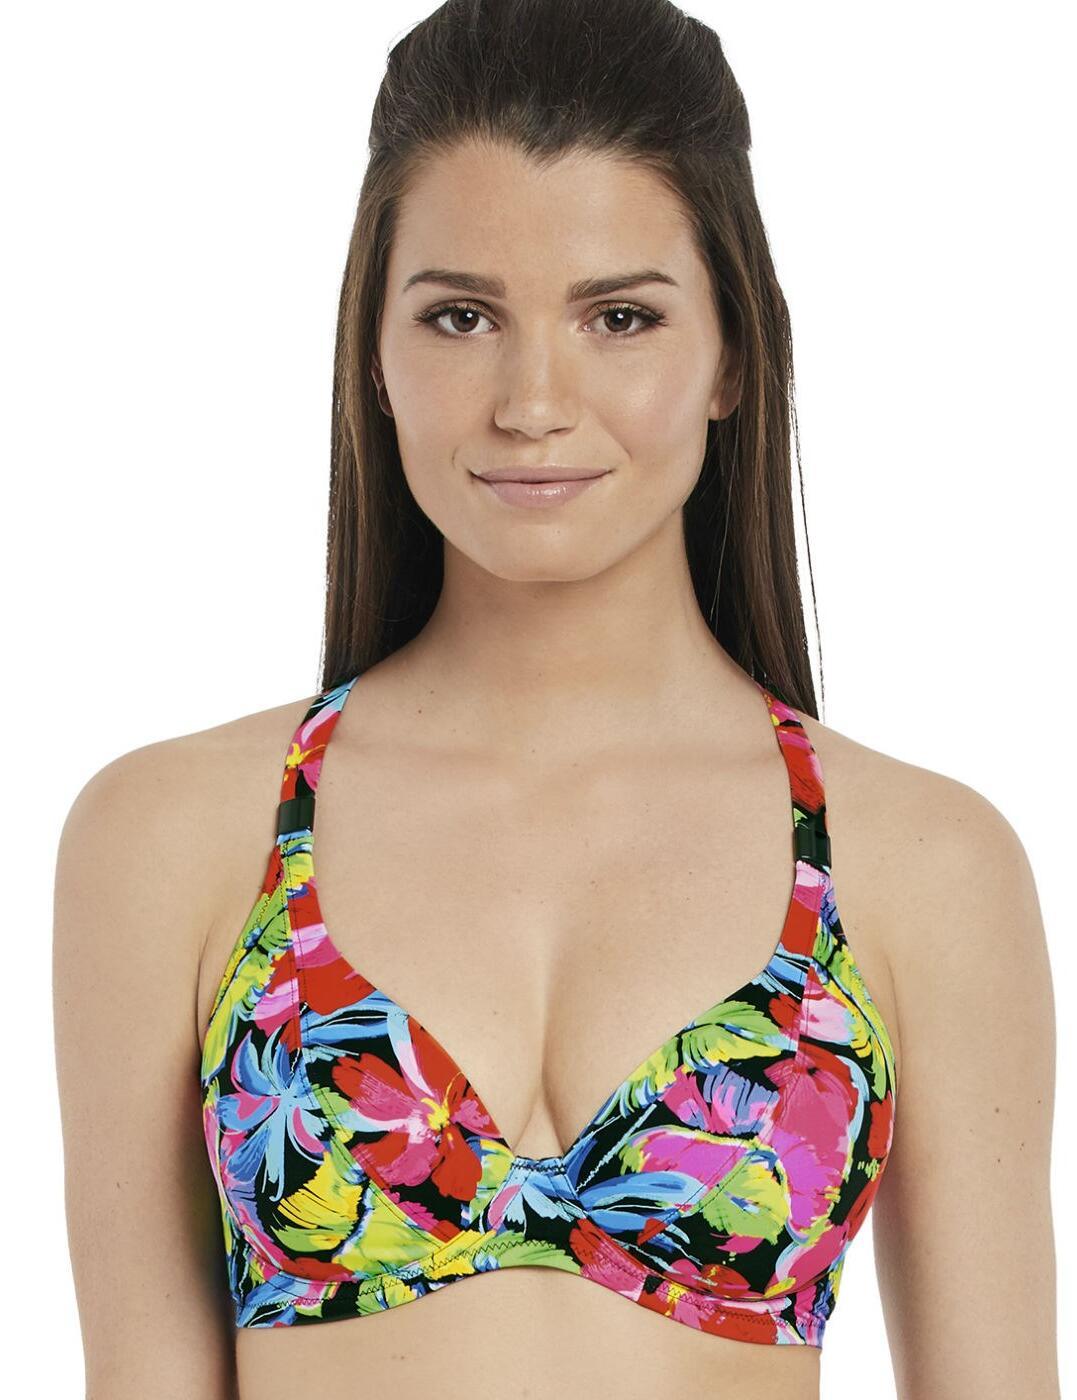 6466 Fantasie Santa Barbara Plunge Convertible Bikini Top - 6466 Multi